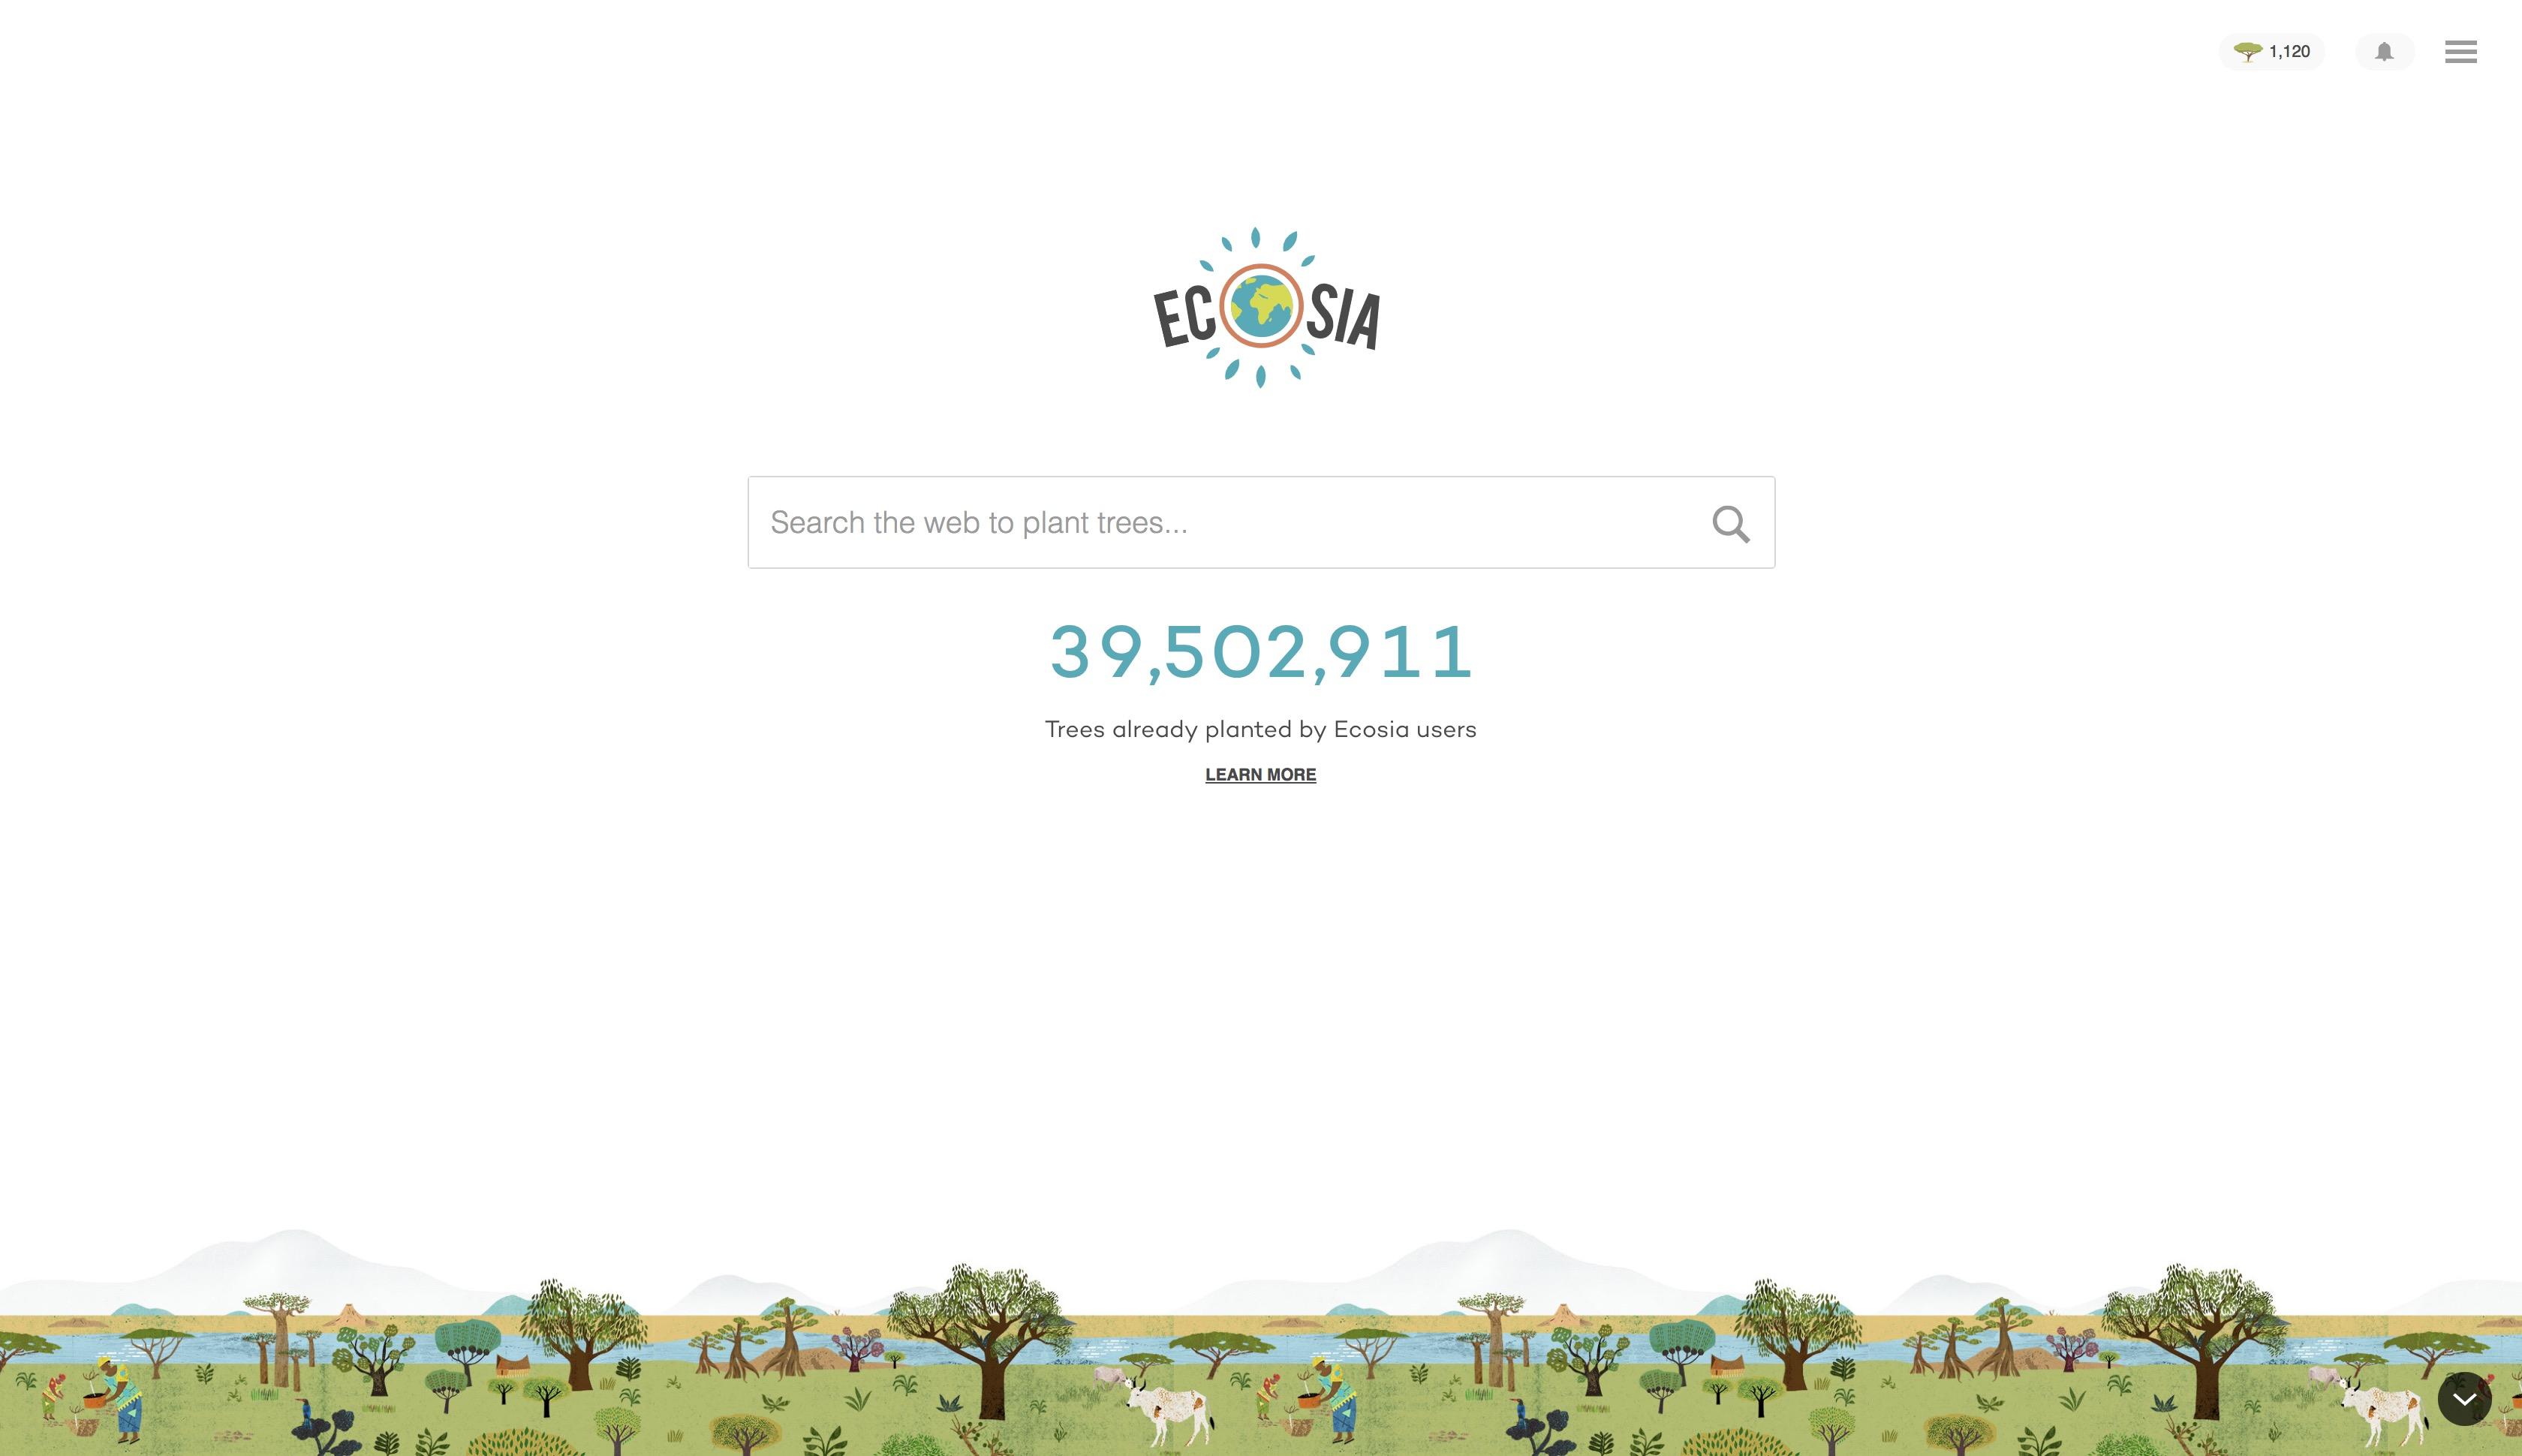 Googleに代わる「検索する度に植樹できるエコな検索エンジン」Ecosia - Akihiro Yasui